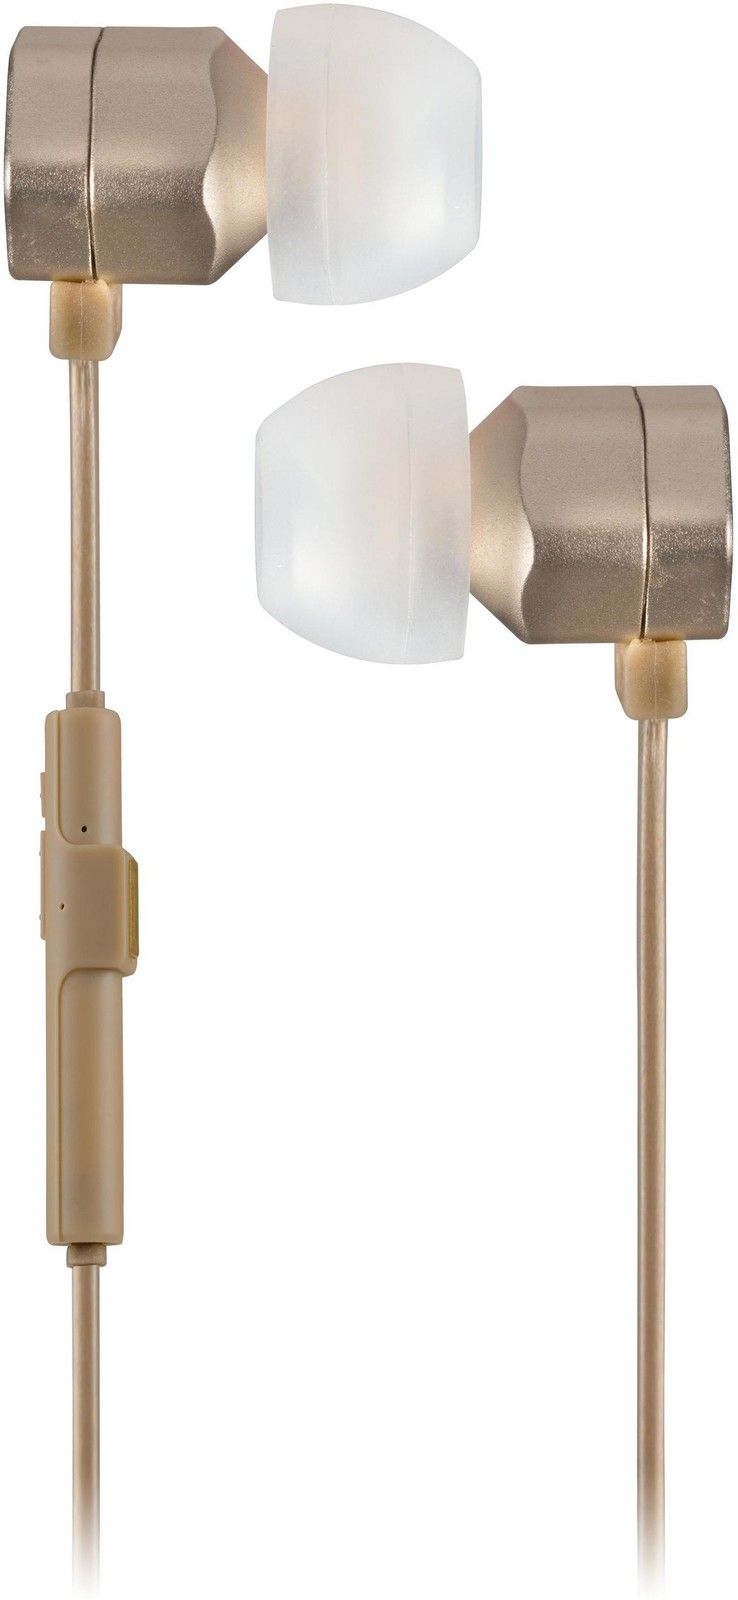 Kitsound Hive Wireless Headset – Roséguld